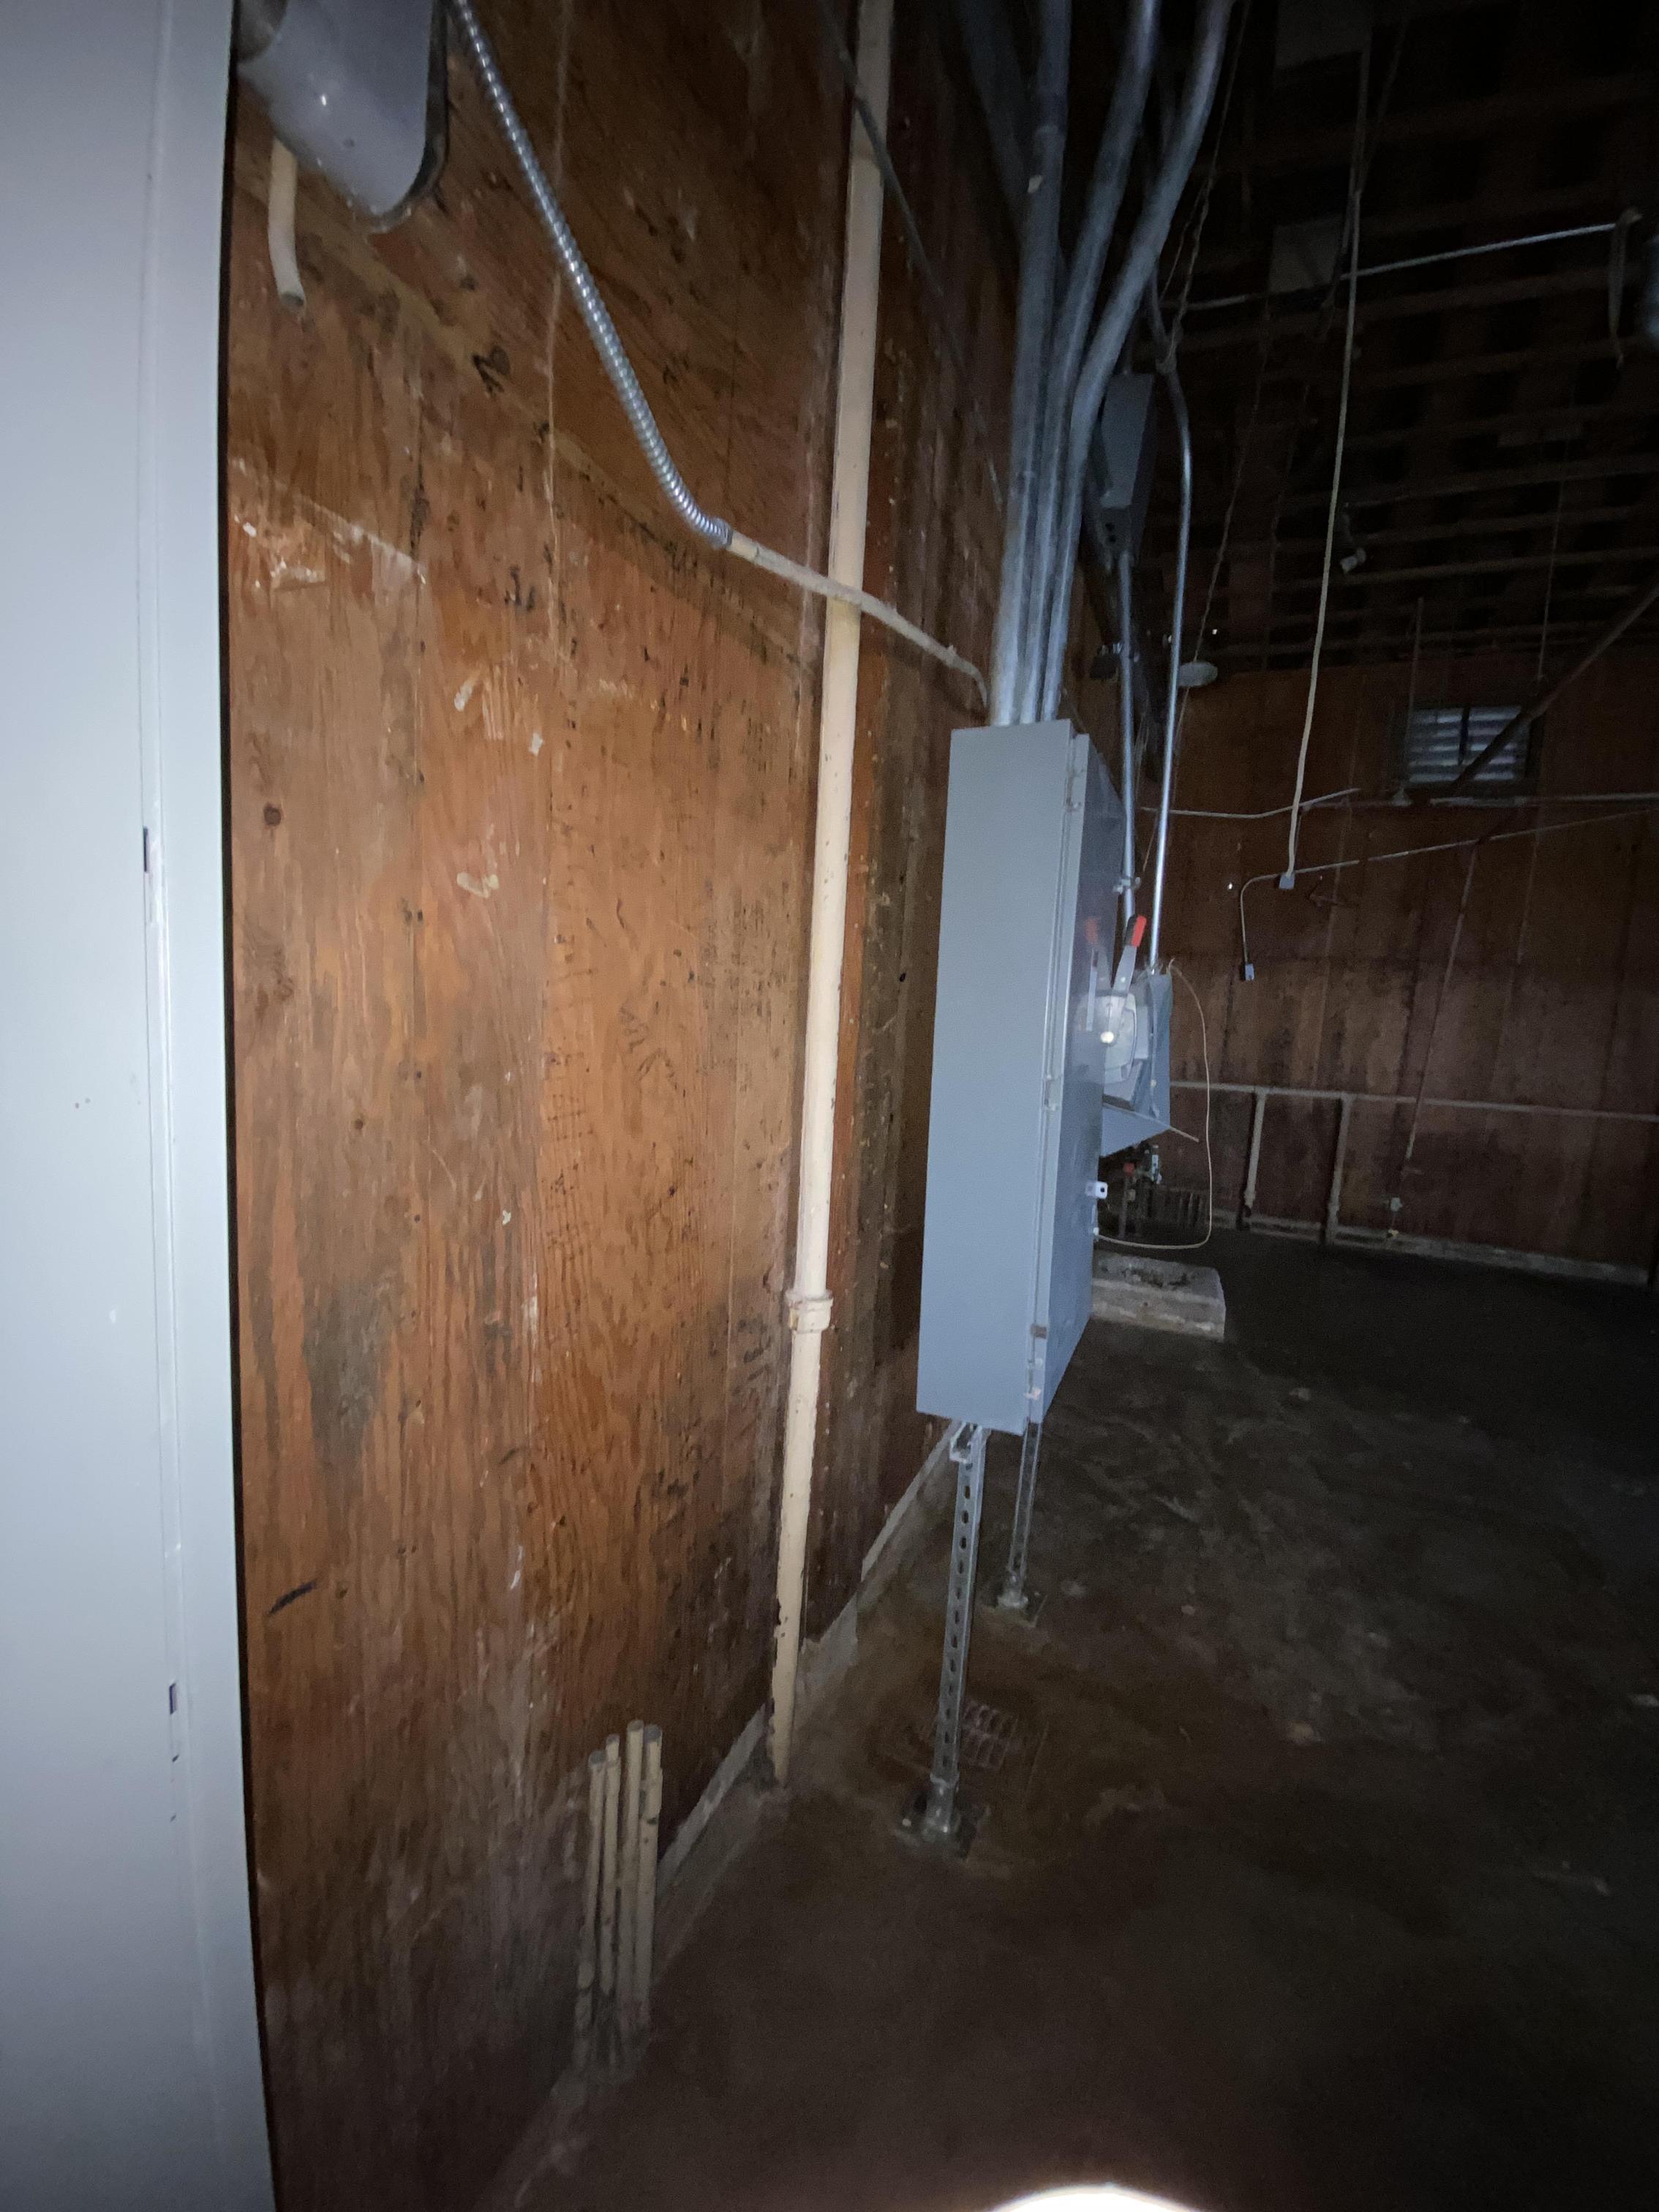 Pic 11 Mech Room as of 20MAR20